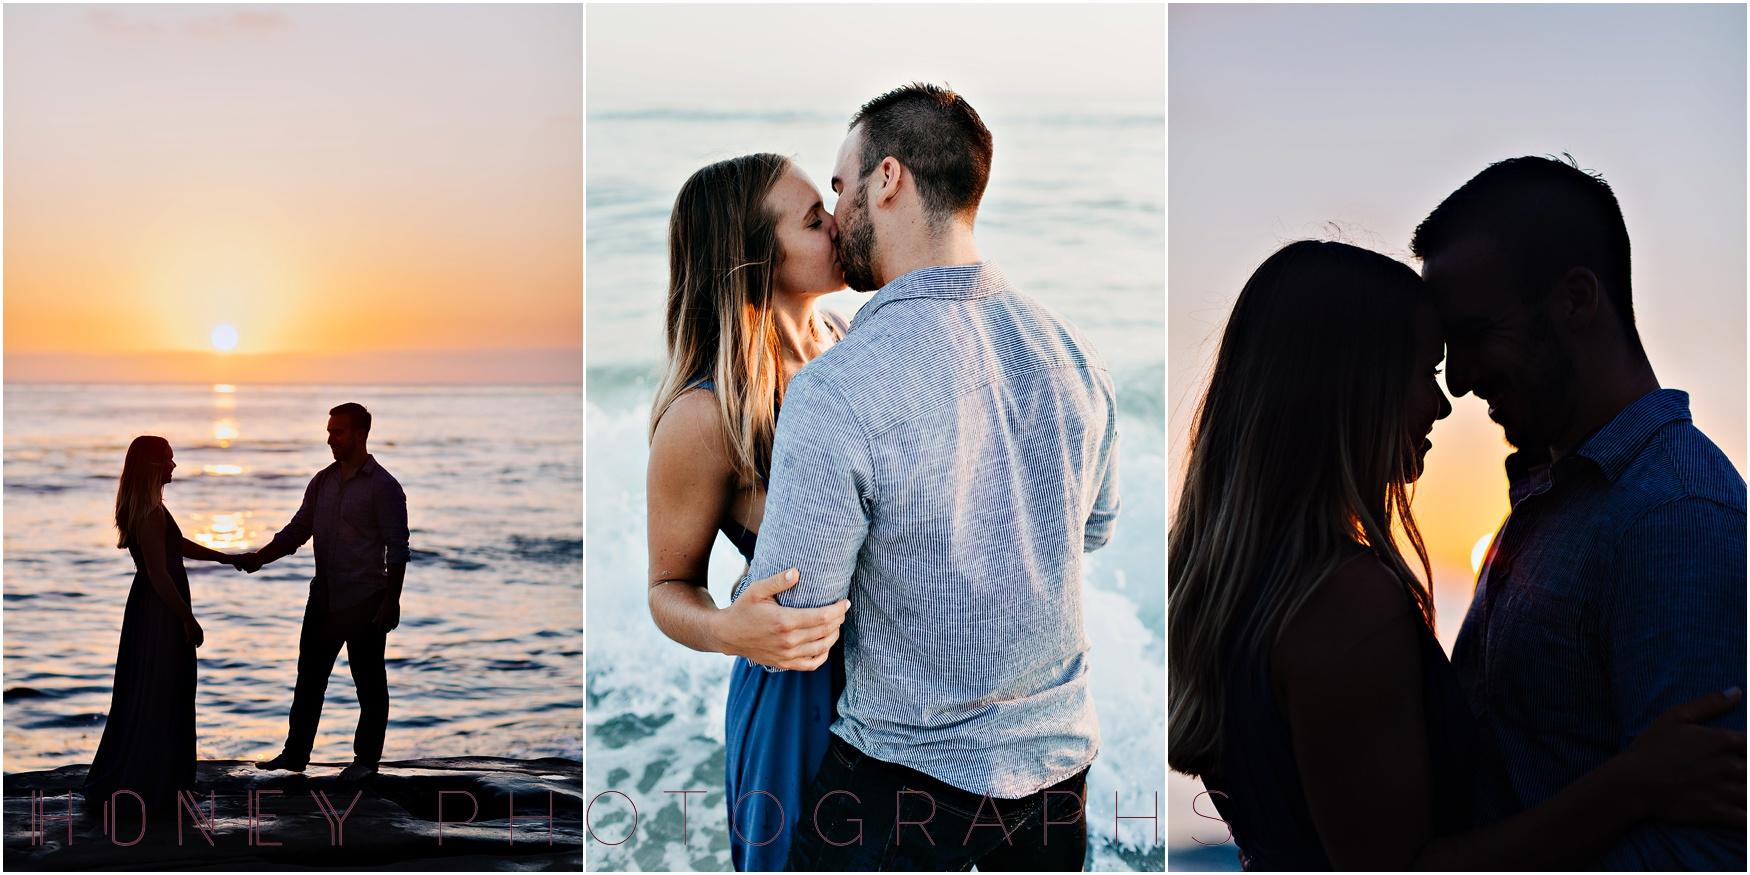 beach_sunset_splash_ocean_la_jolla_windandsea_engagement028.jpg